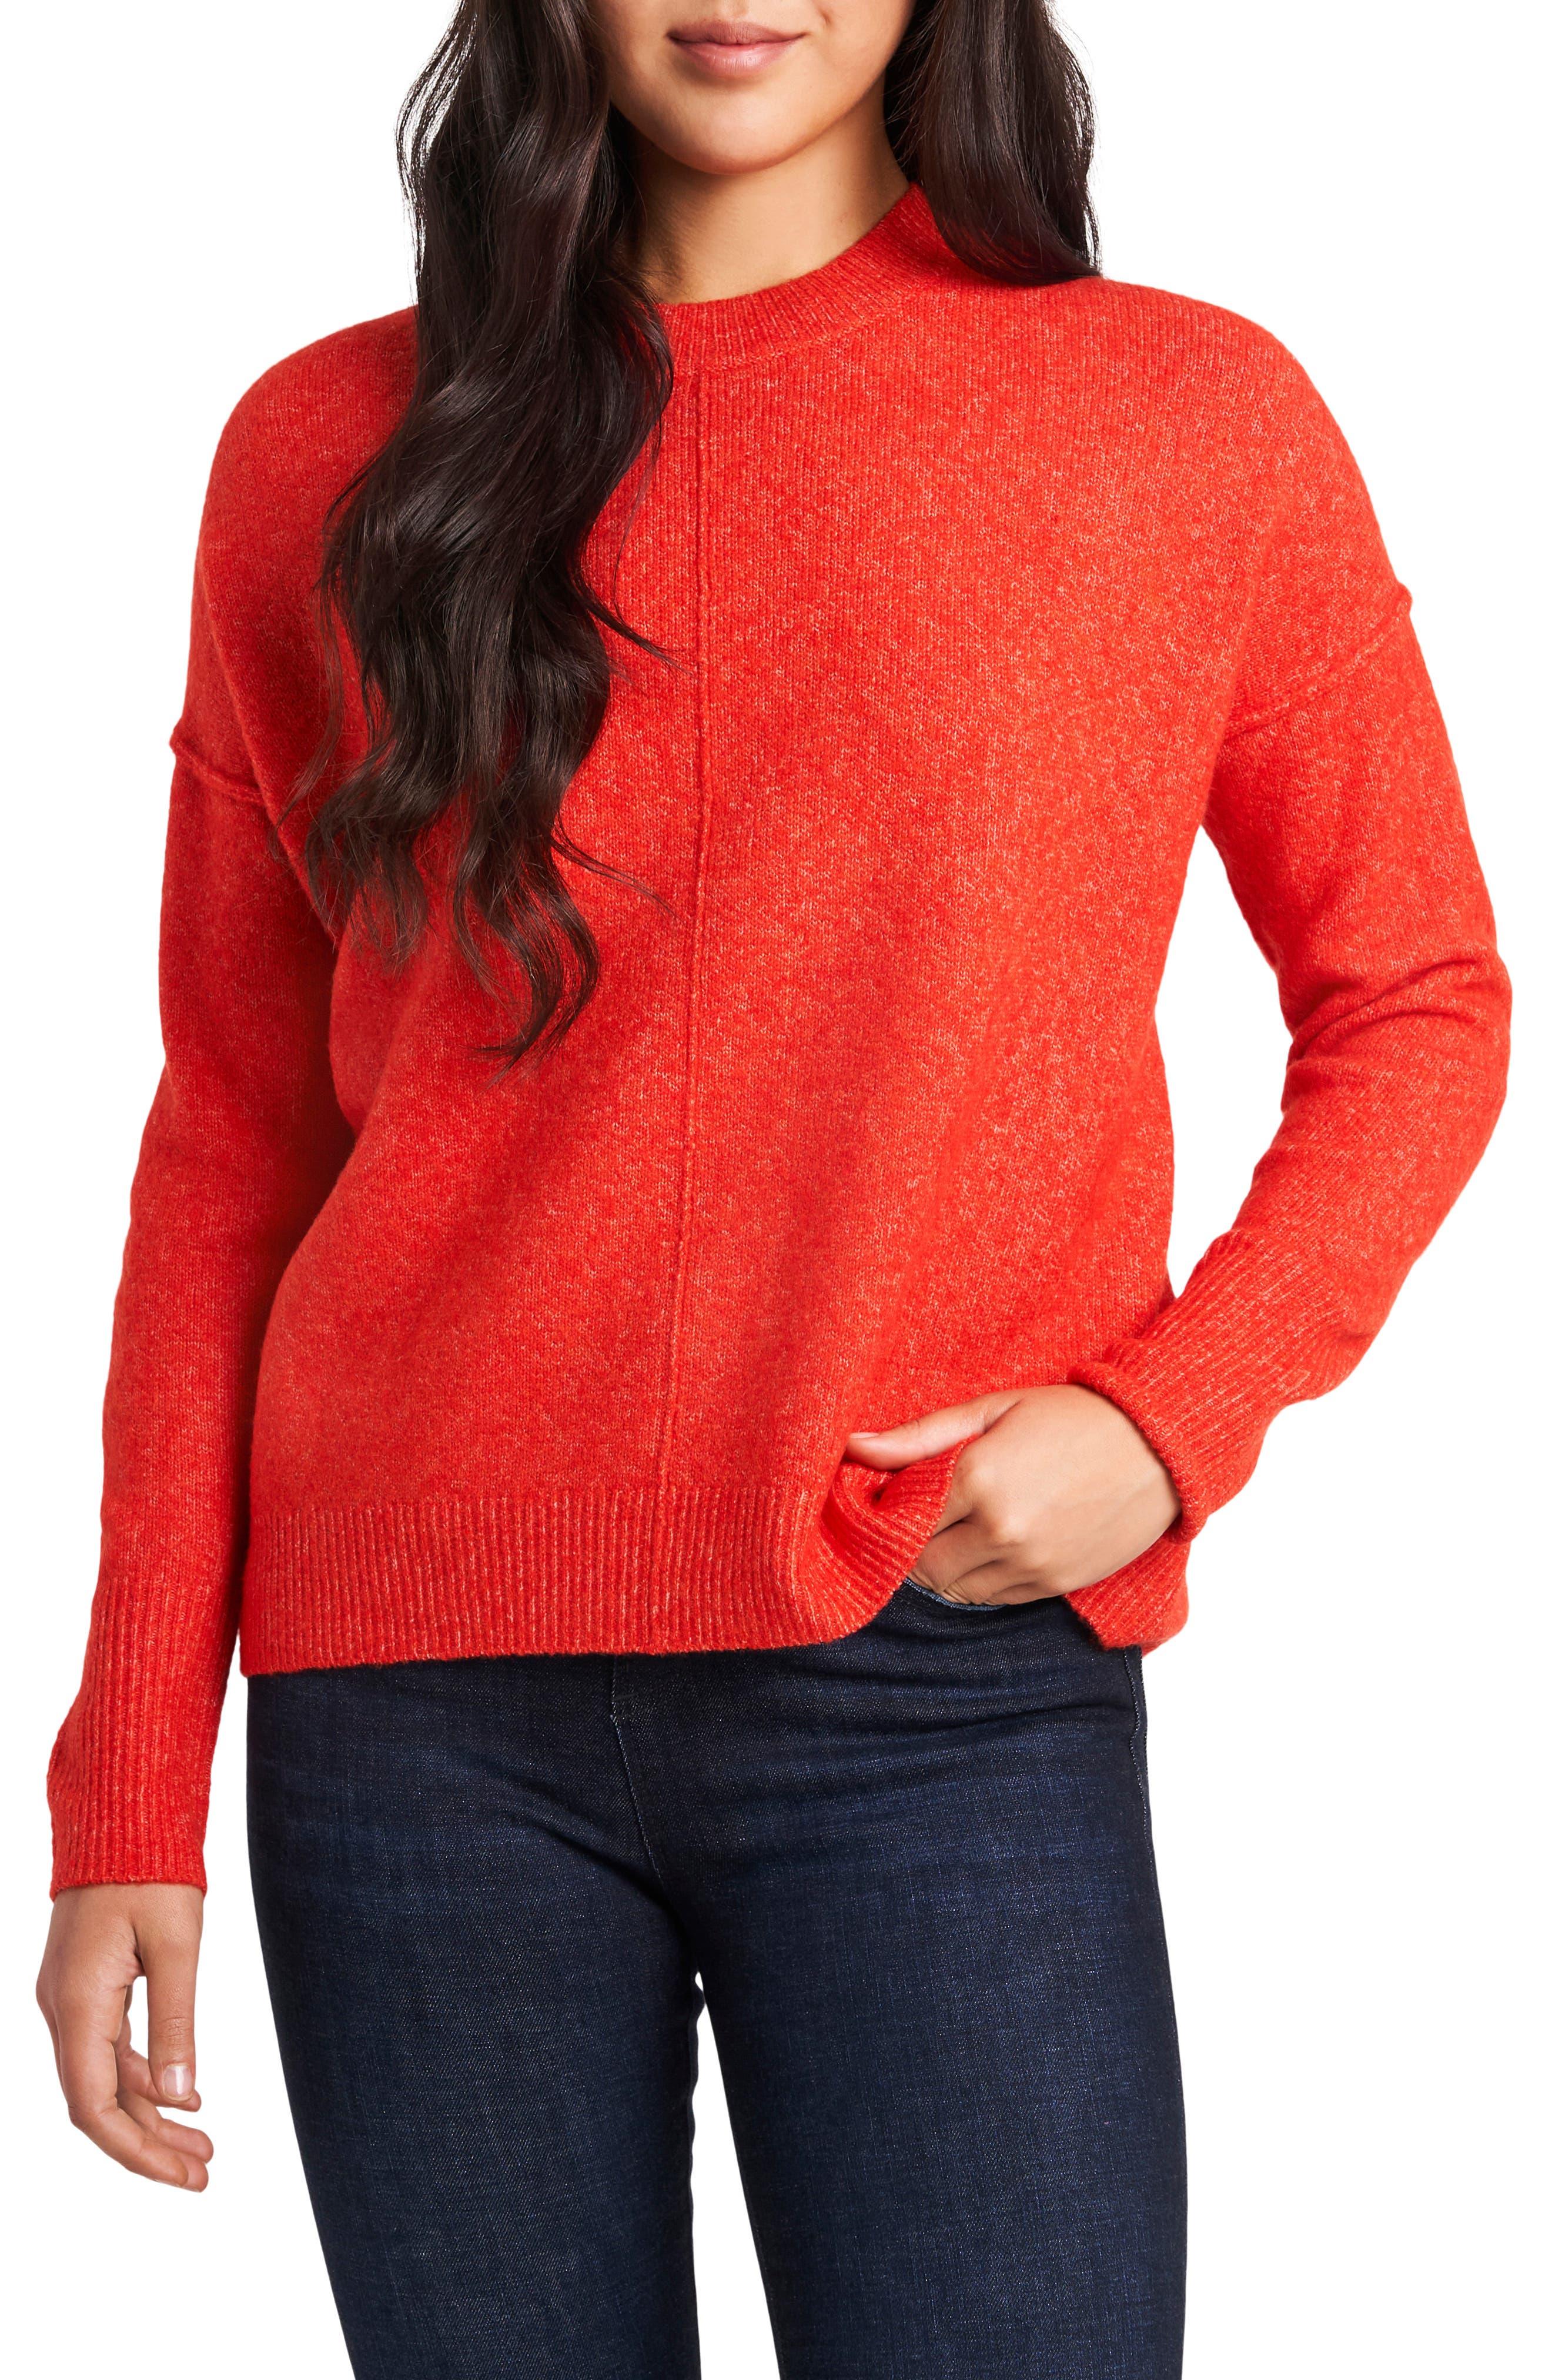 Image of Vince Camuto Crewneck Sweater